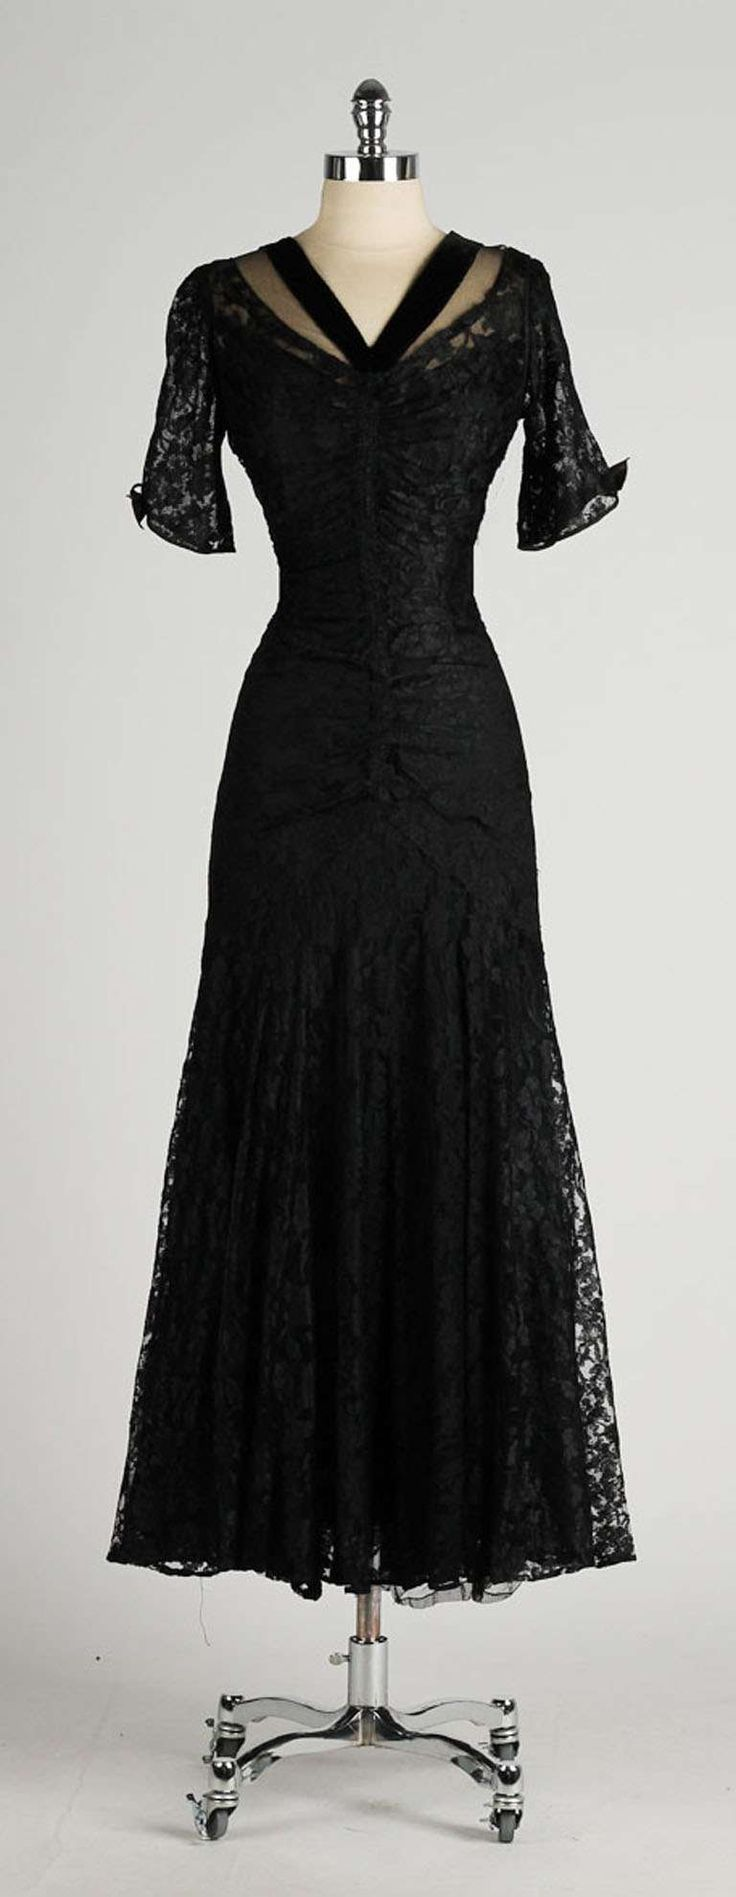 Black dress vintage - Vintage 1940 S Black Chantilly Lace Illusion Bodice Dress